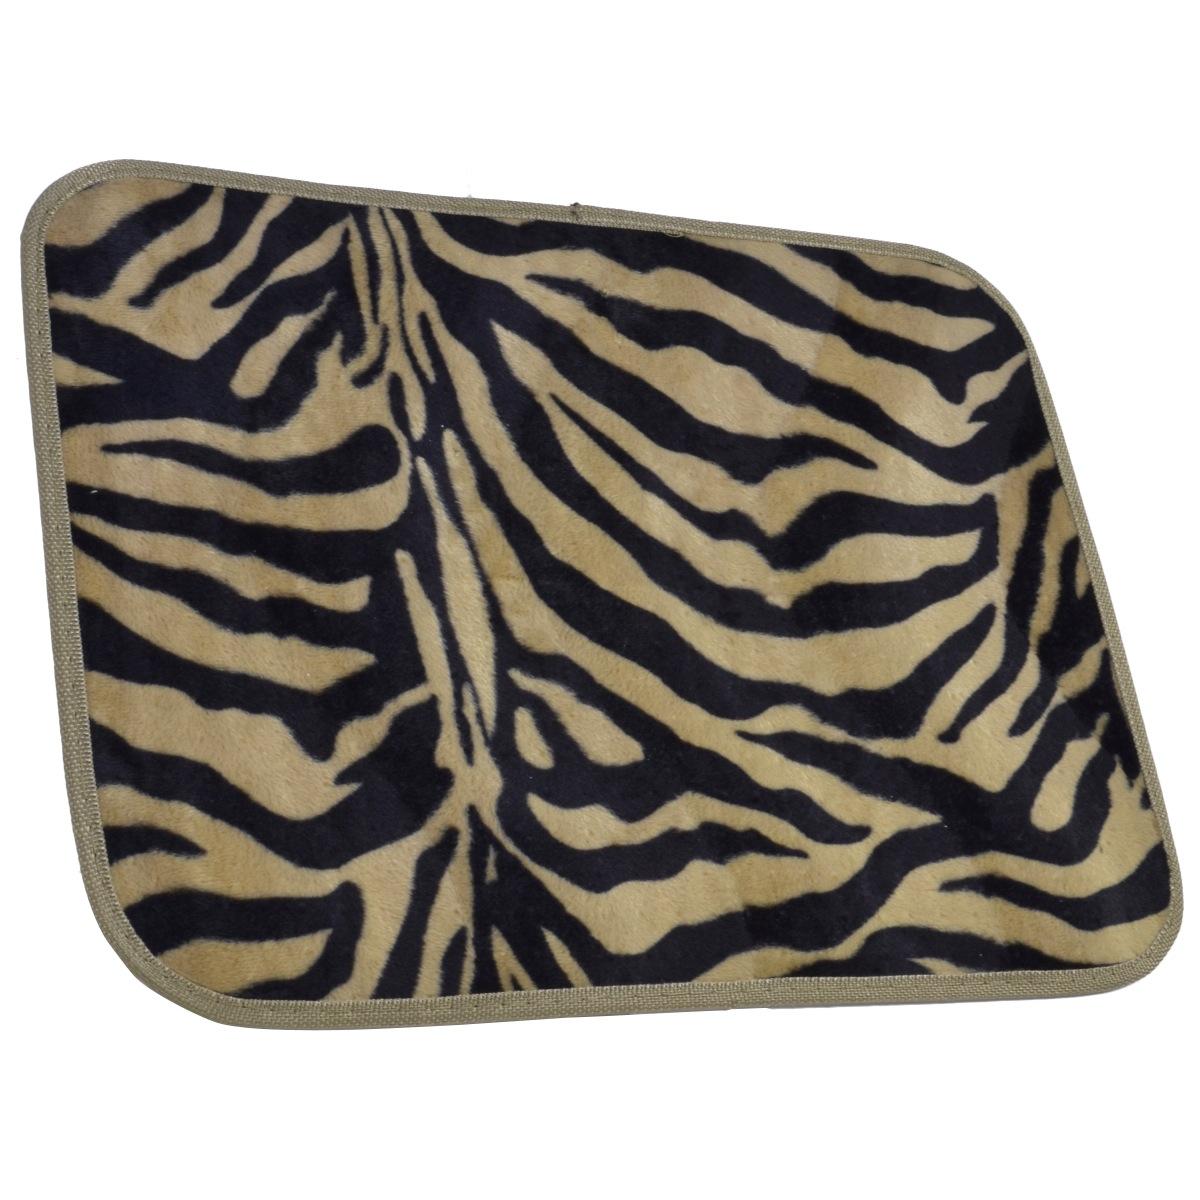 15pc Zebra Premium Animal Print Seat Covers And Front